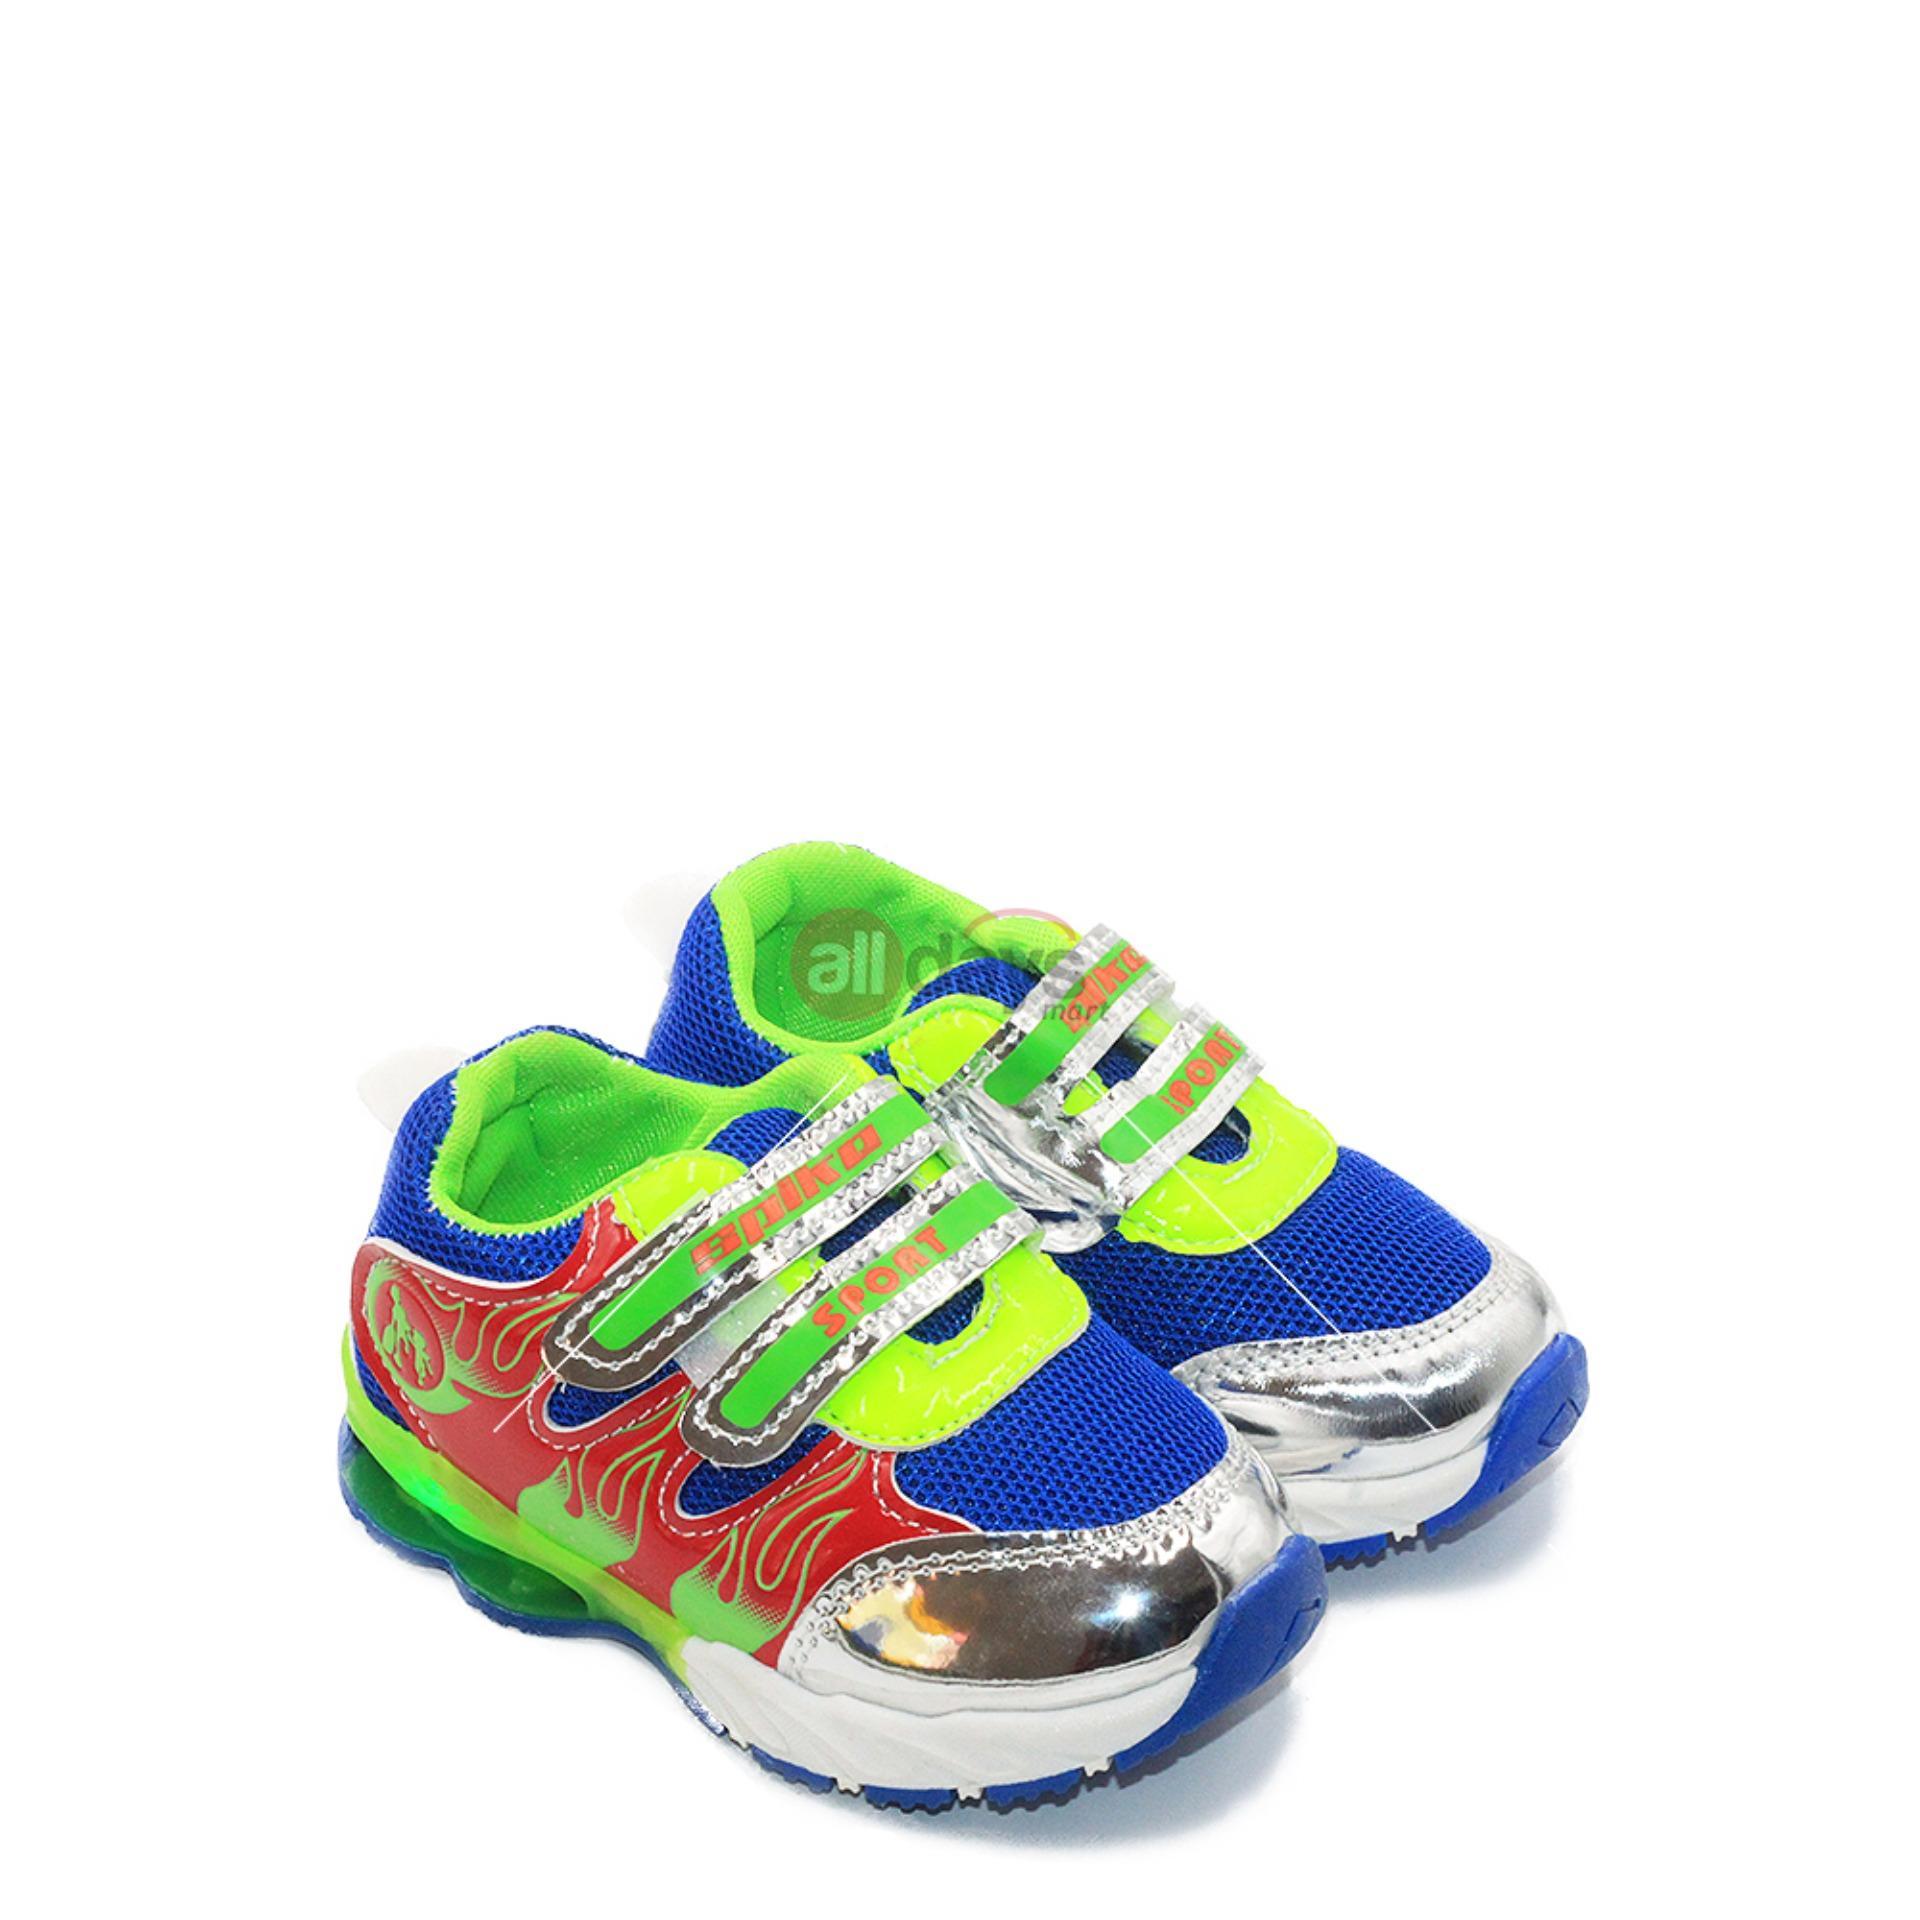 Cuci Gudang Spike Sepatu Sneakers Anak Laki Laki Led Jkl 5369 Blue Ada Per Di Sol